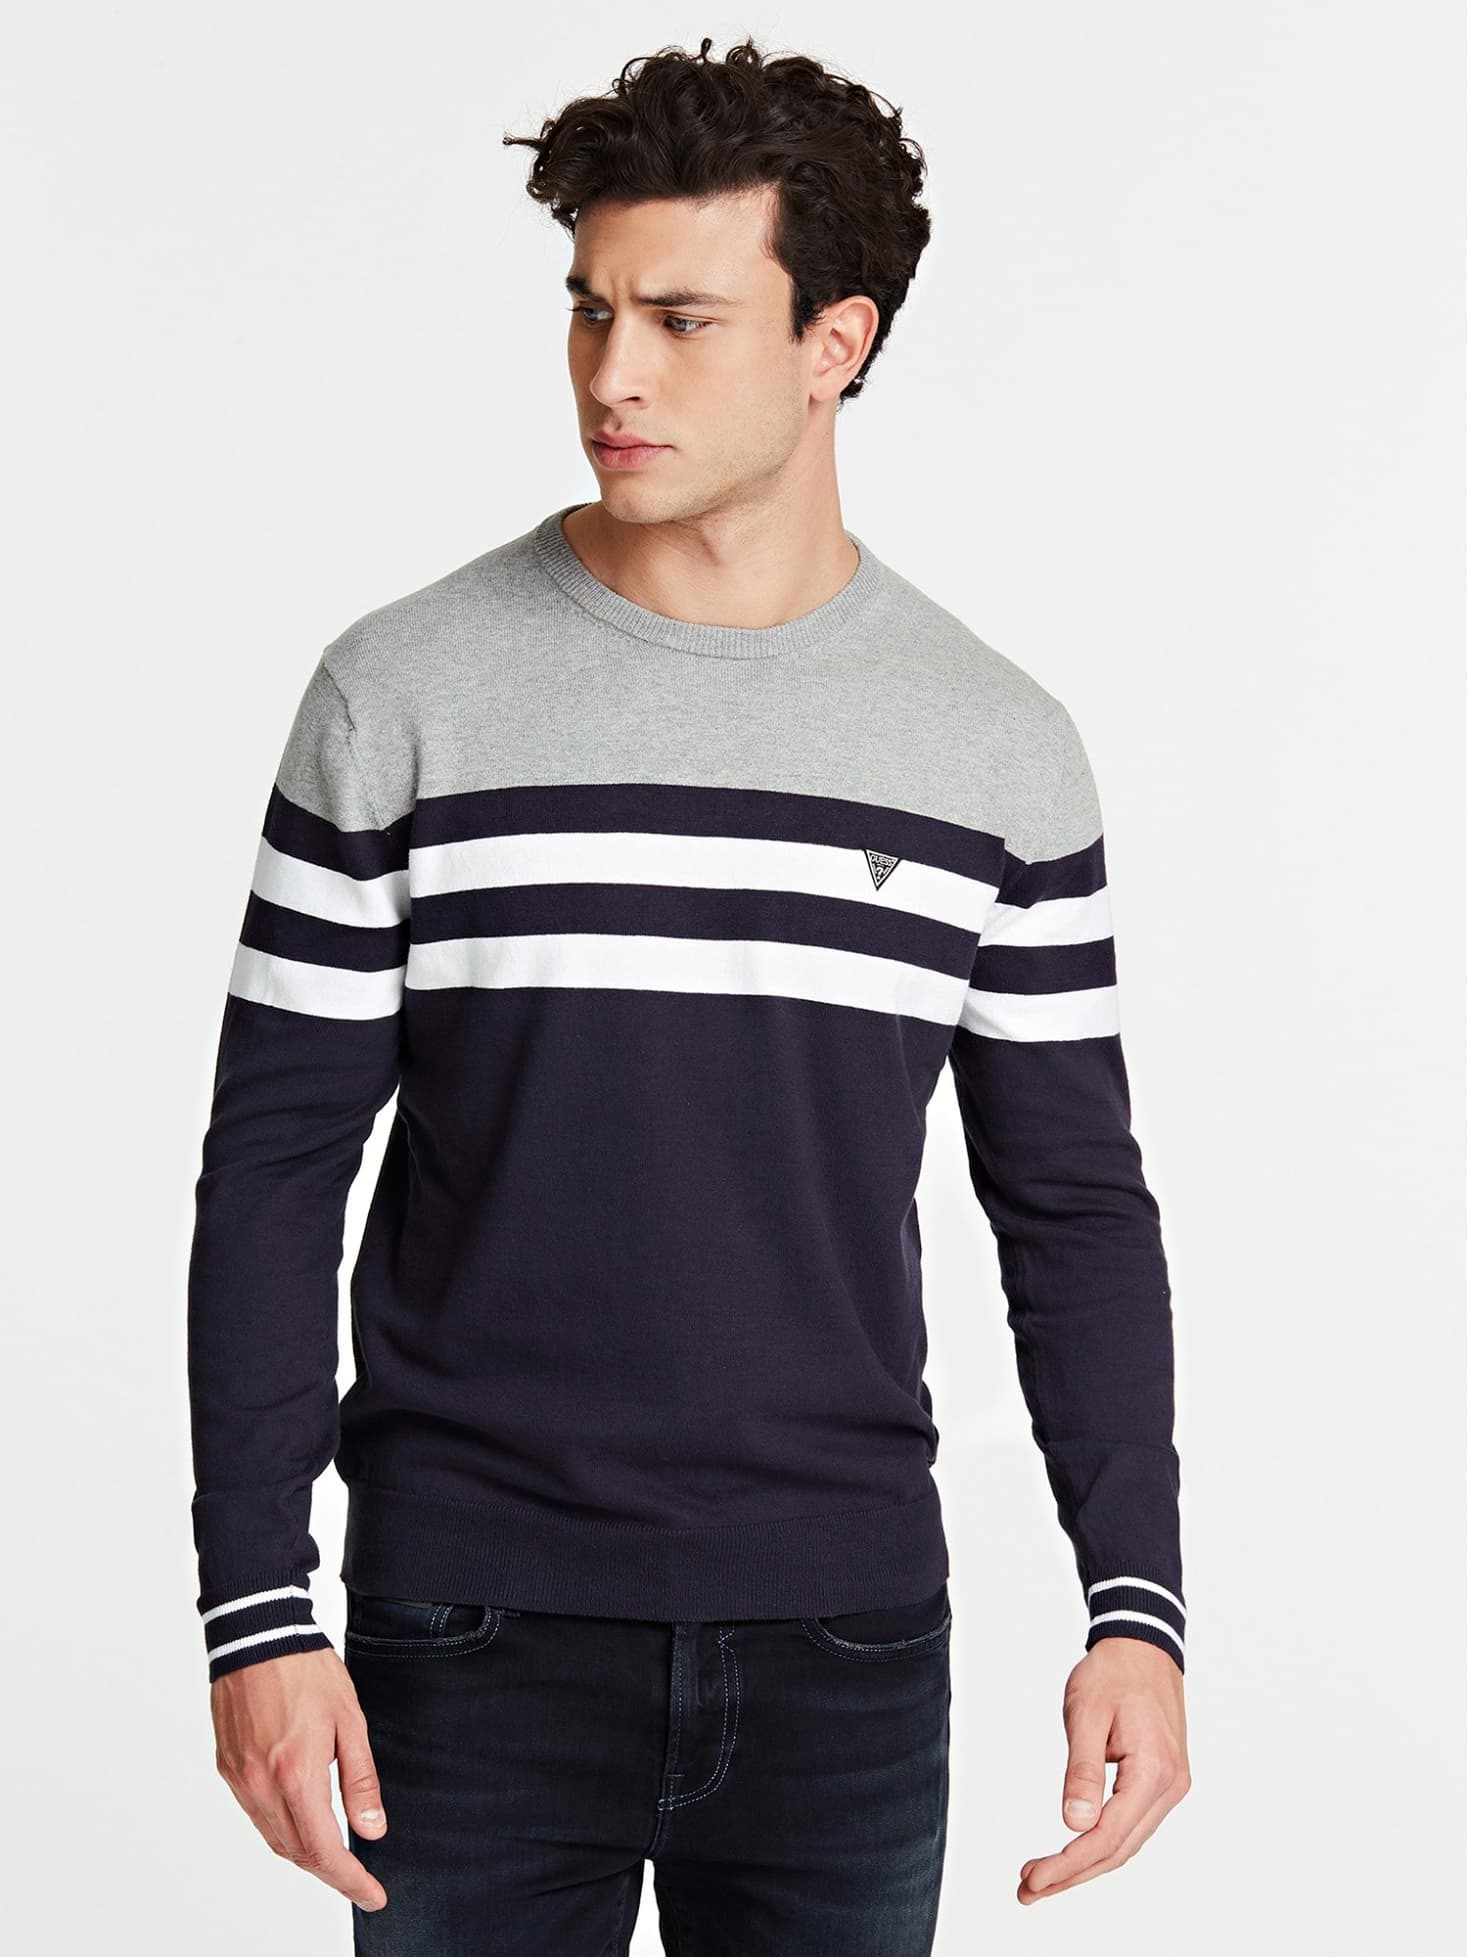 Guess Sweater Black/White/Melange YTRVZ6M6QQ1QW